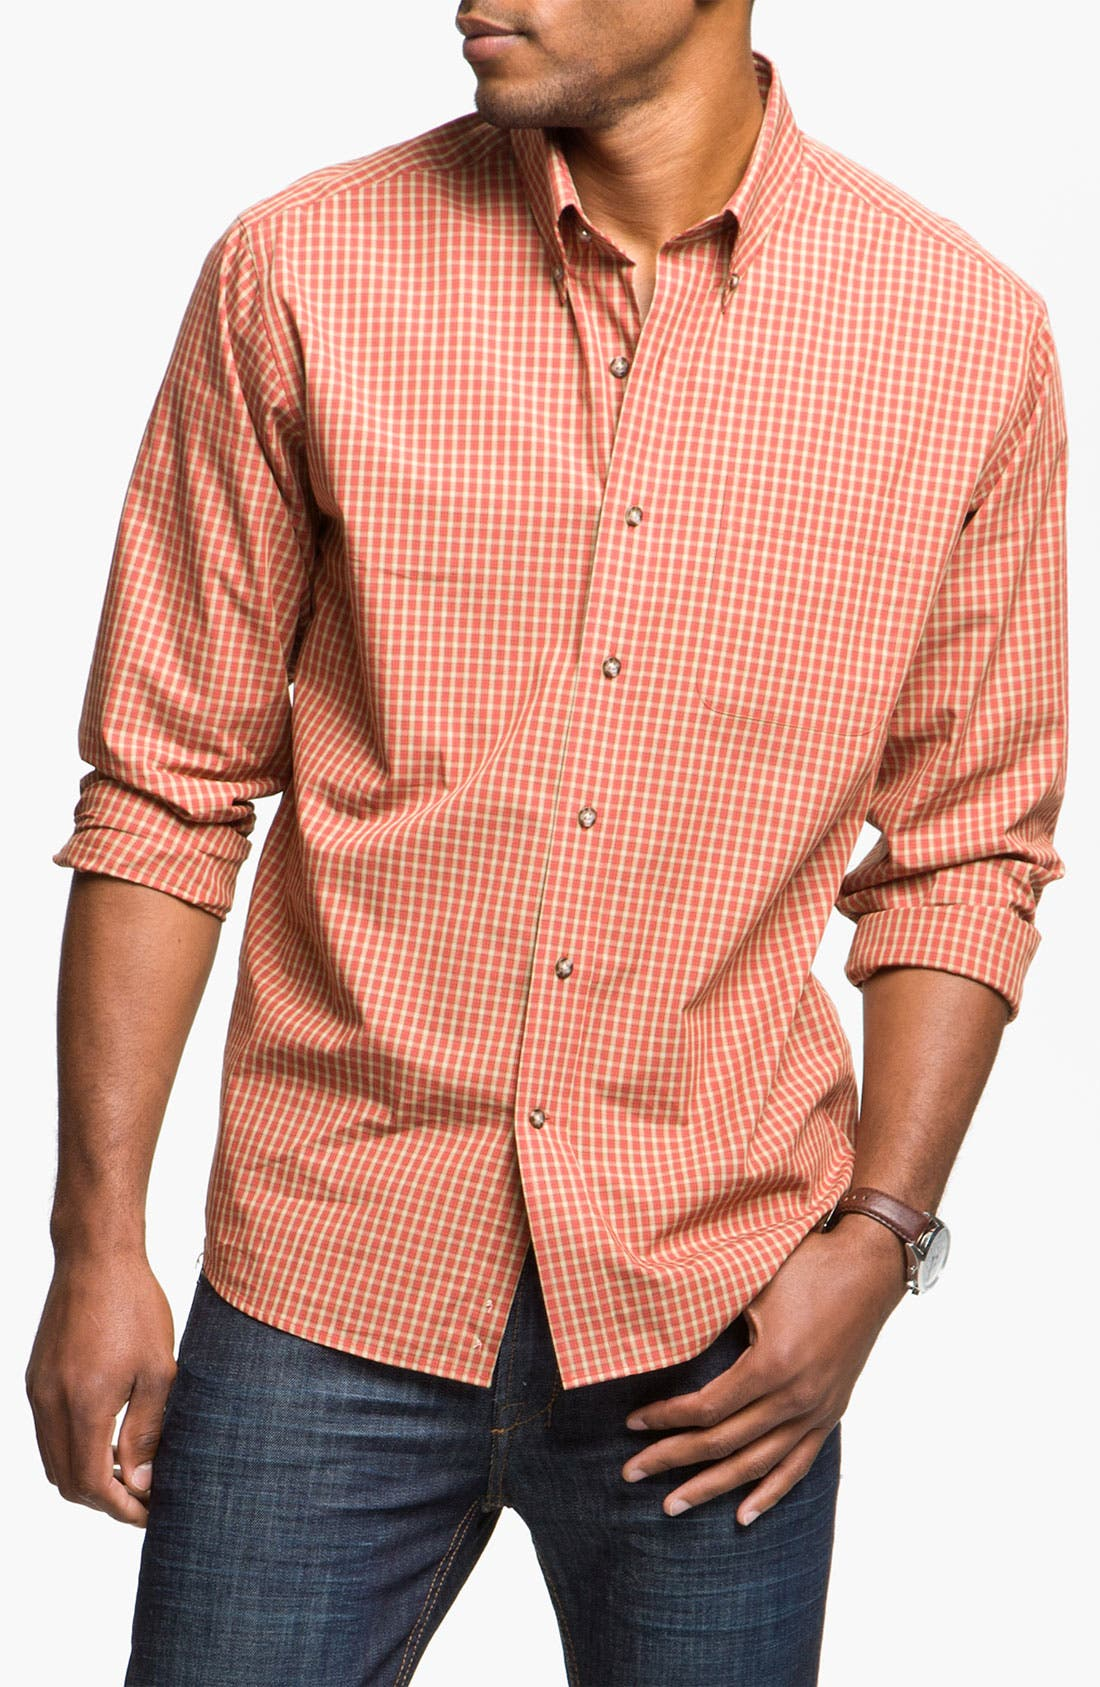 Alternate Image 1 Selected - Cutter & Buck 'Spruce' Check Sport Shirt (Big & Tall)